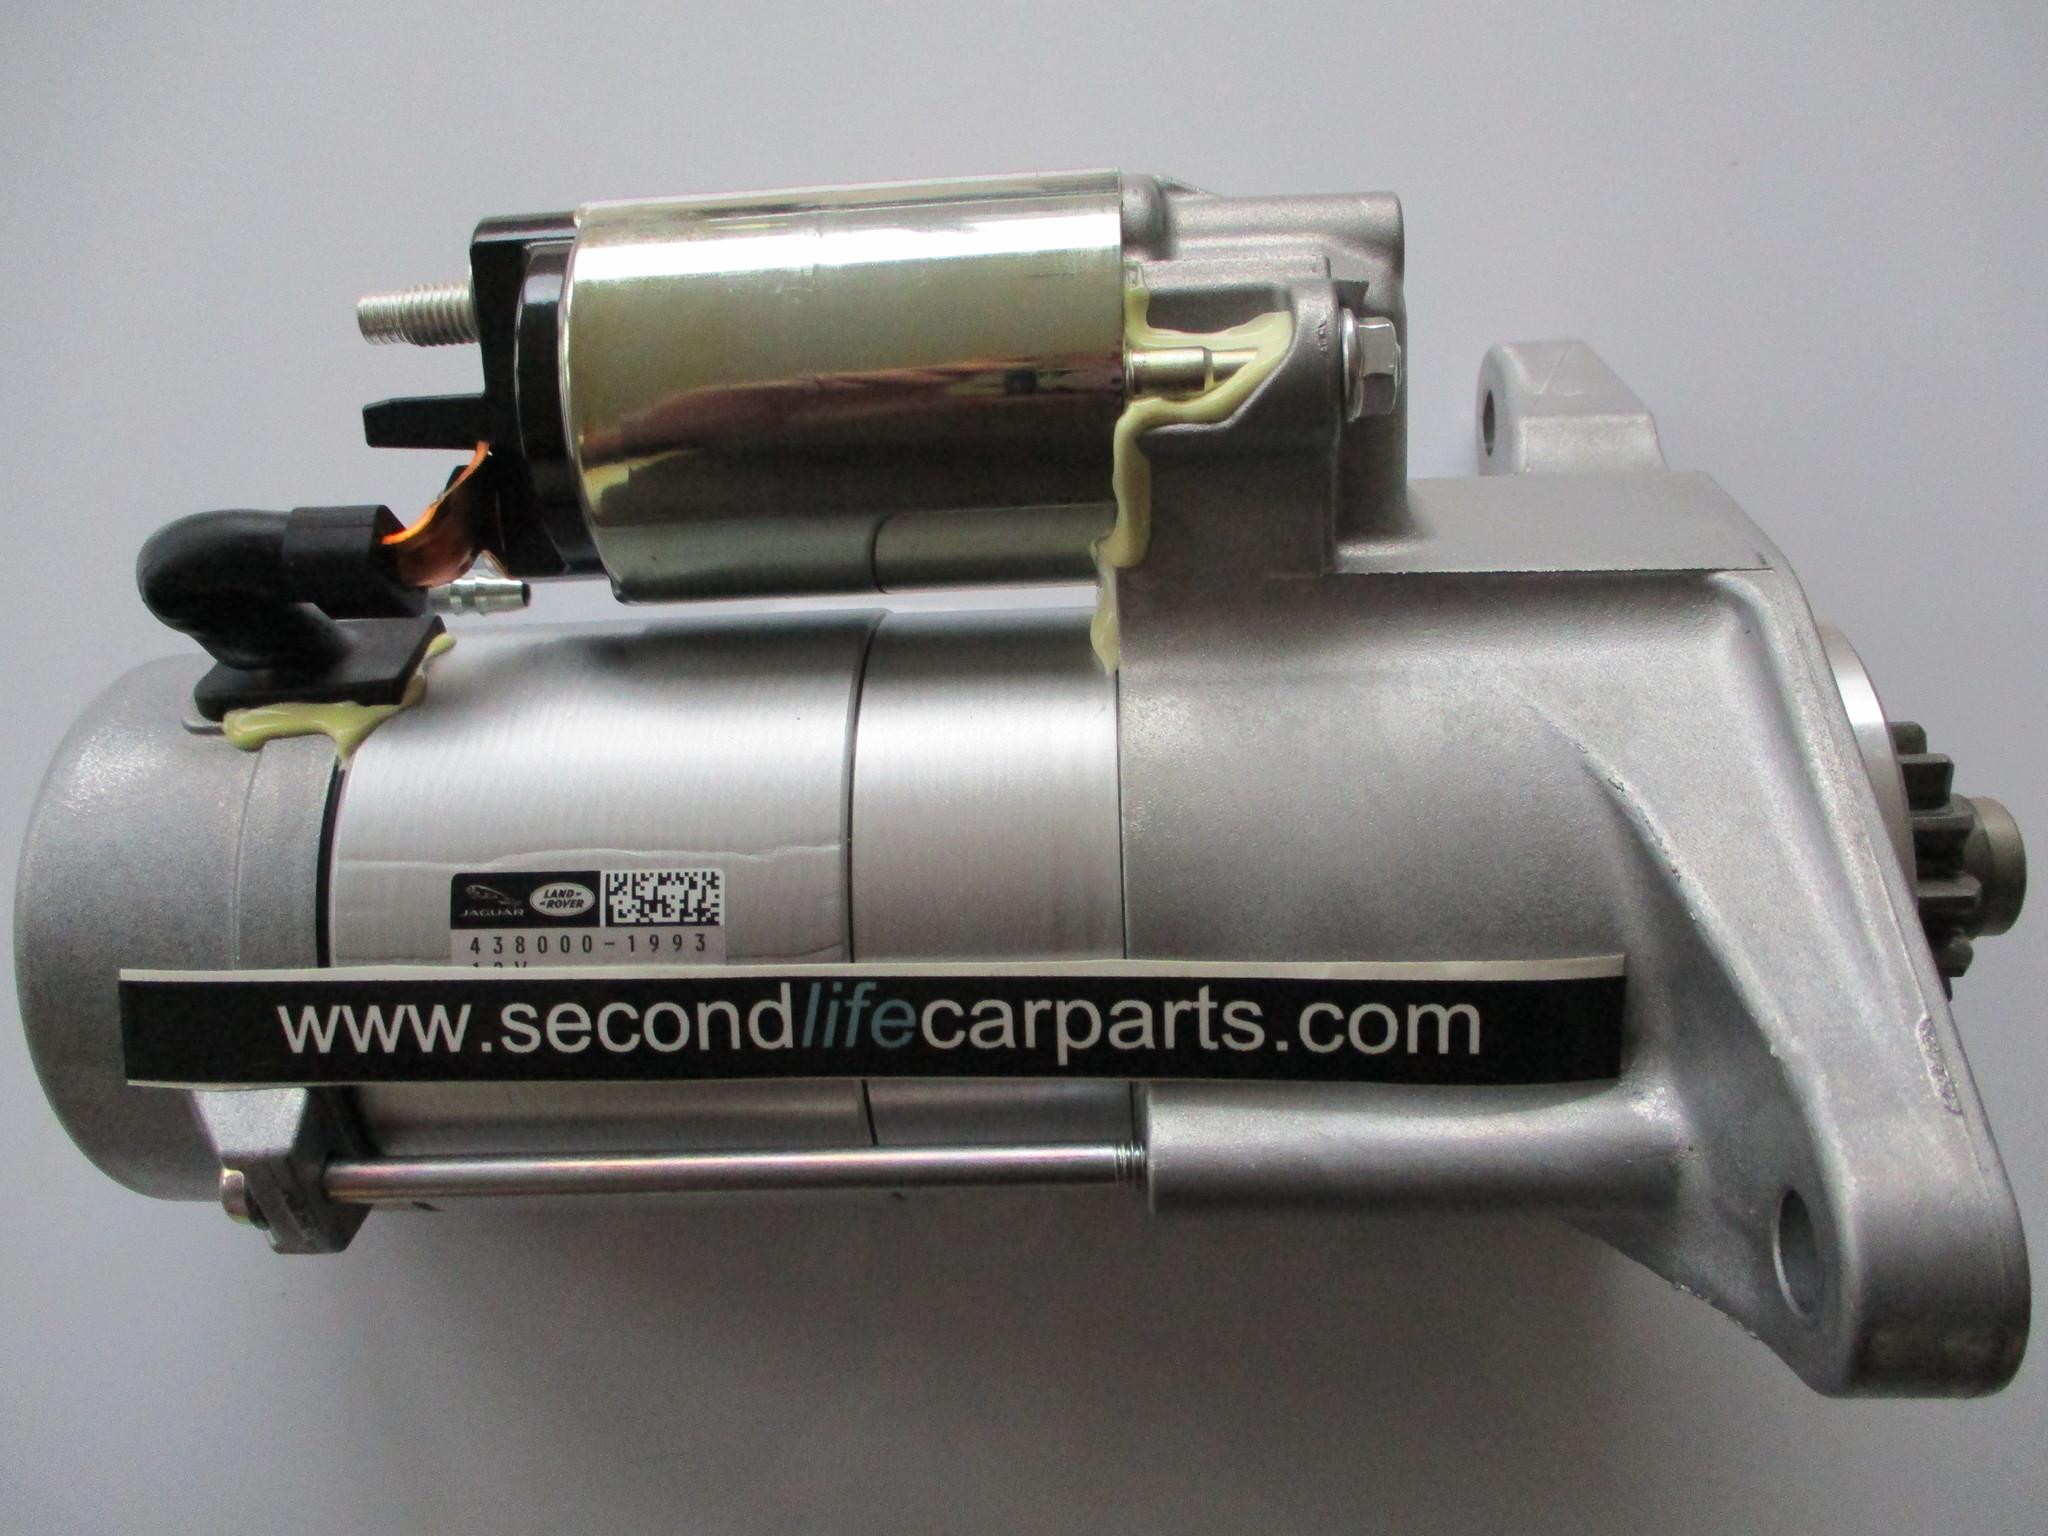 LR085507 J9C1876  Genuine Starter Motor 2.0 Litre Diesel